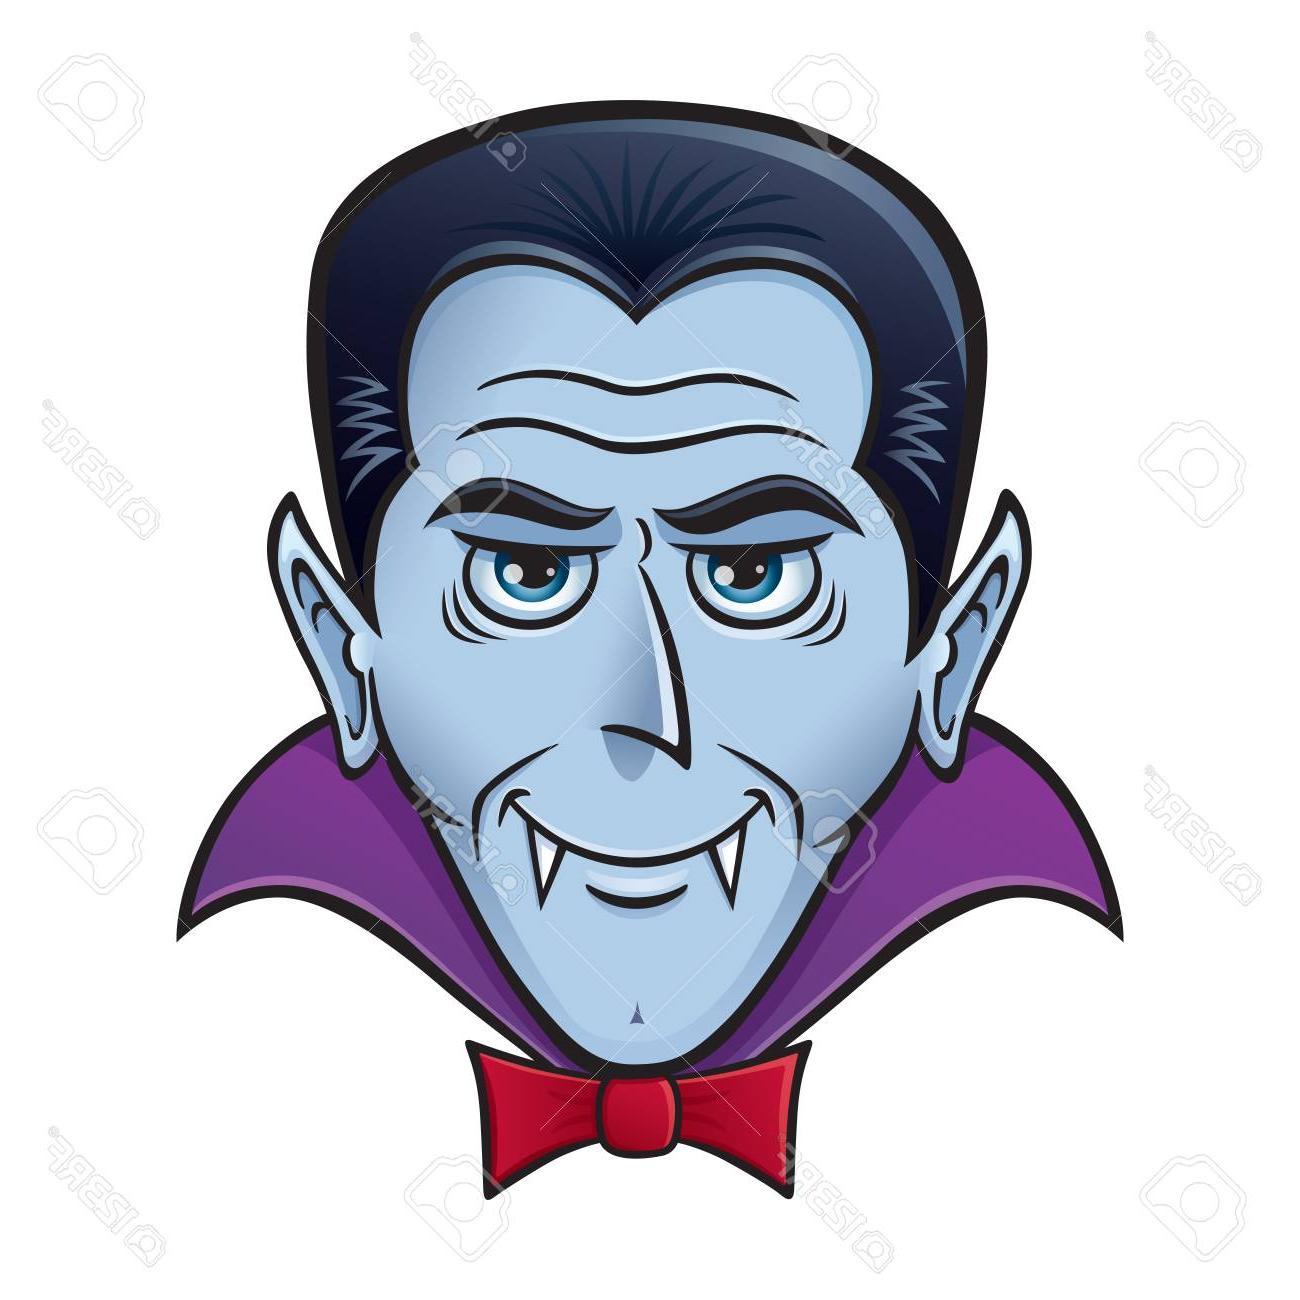 image freeuse Vampir clipart vector. Best free halloween vampire